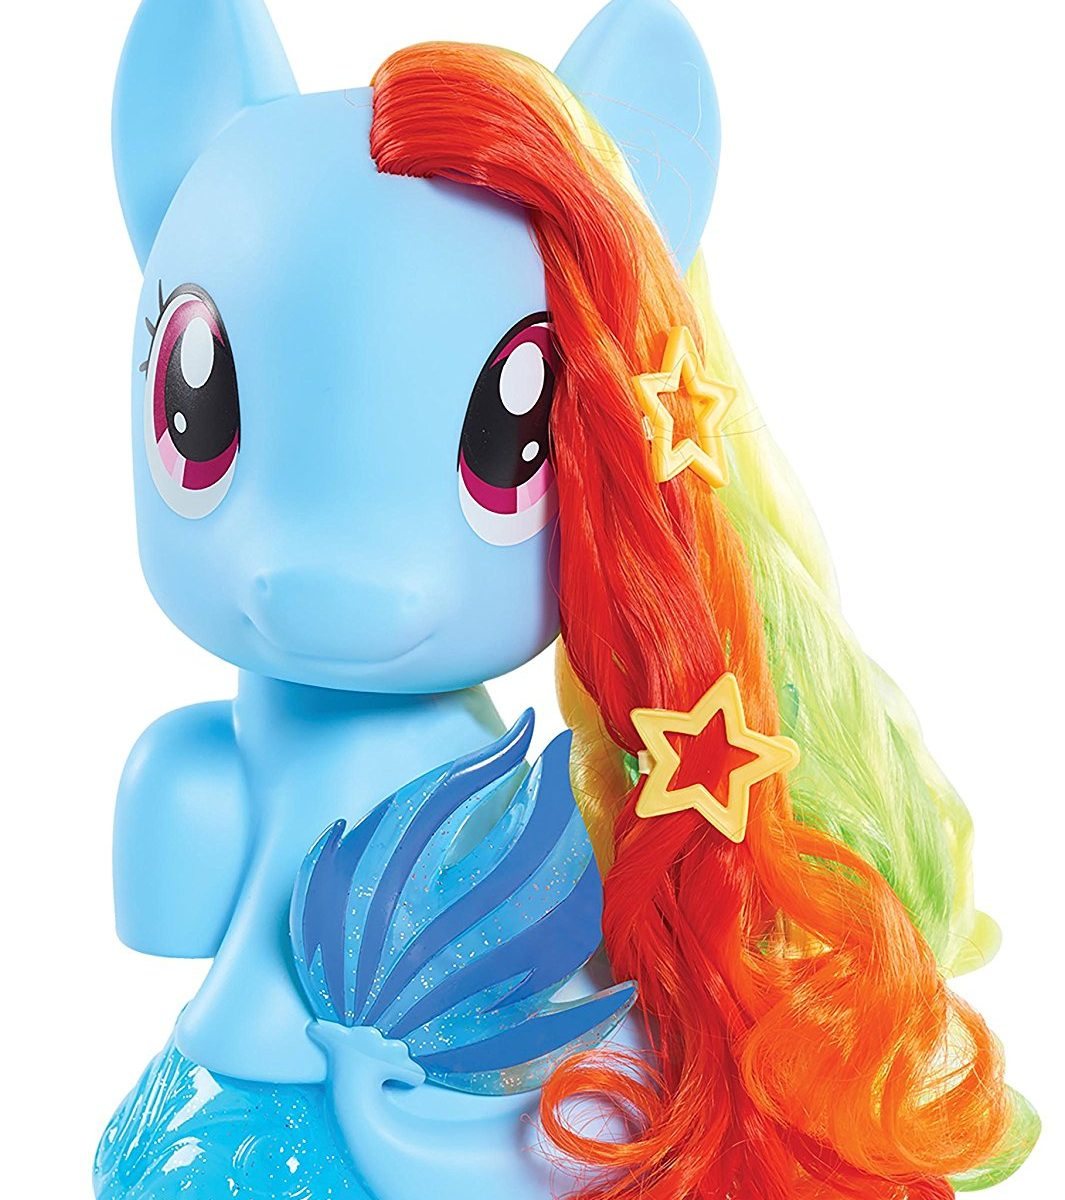 MLP: TM Rainbow Dash Sea-pony Styling Head Set 2